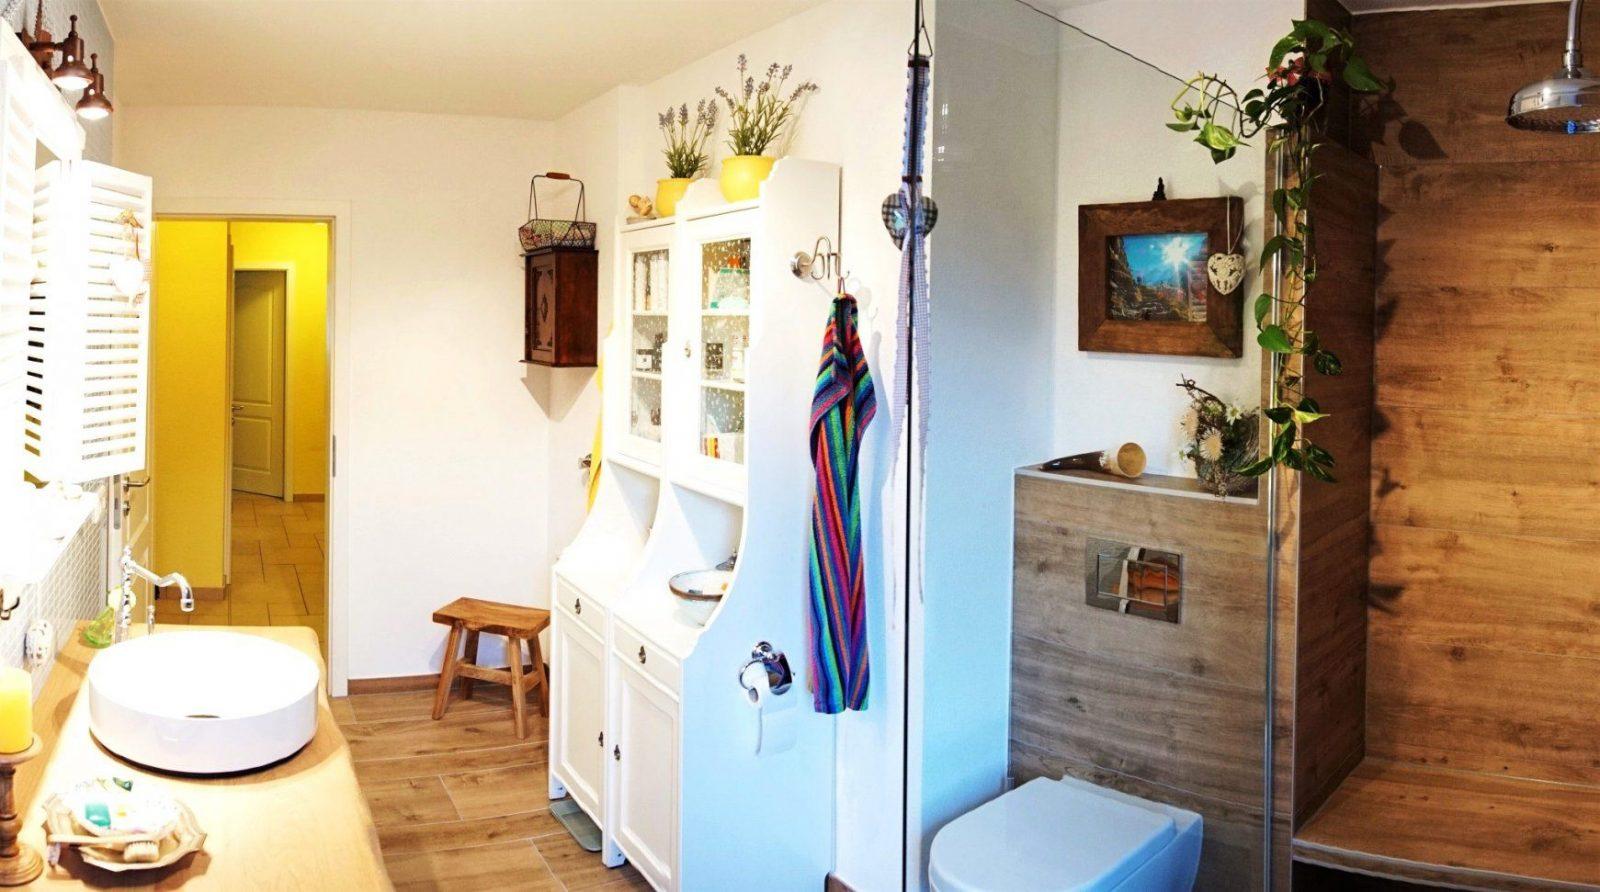 Badezimmer Rustikal Und Trotzdem Cool Ansprechend Auf Dekoideen Fur von Badezimmer Rustikal Und Trotzdem Cool Bild